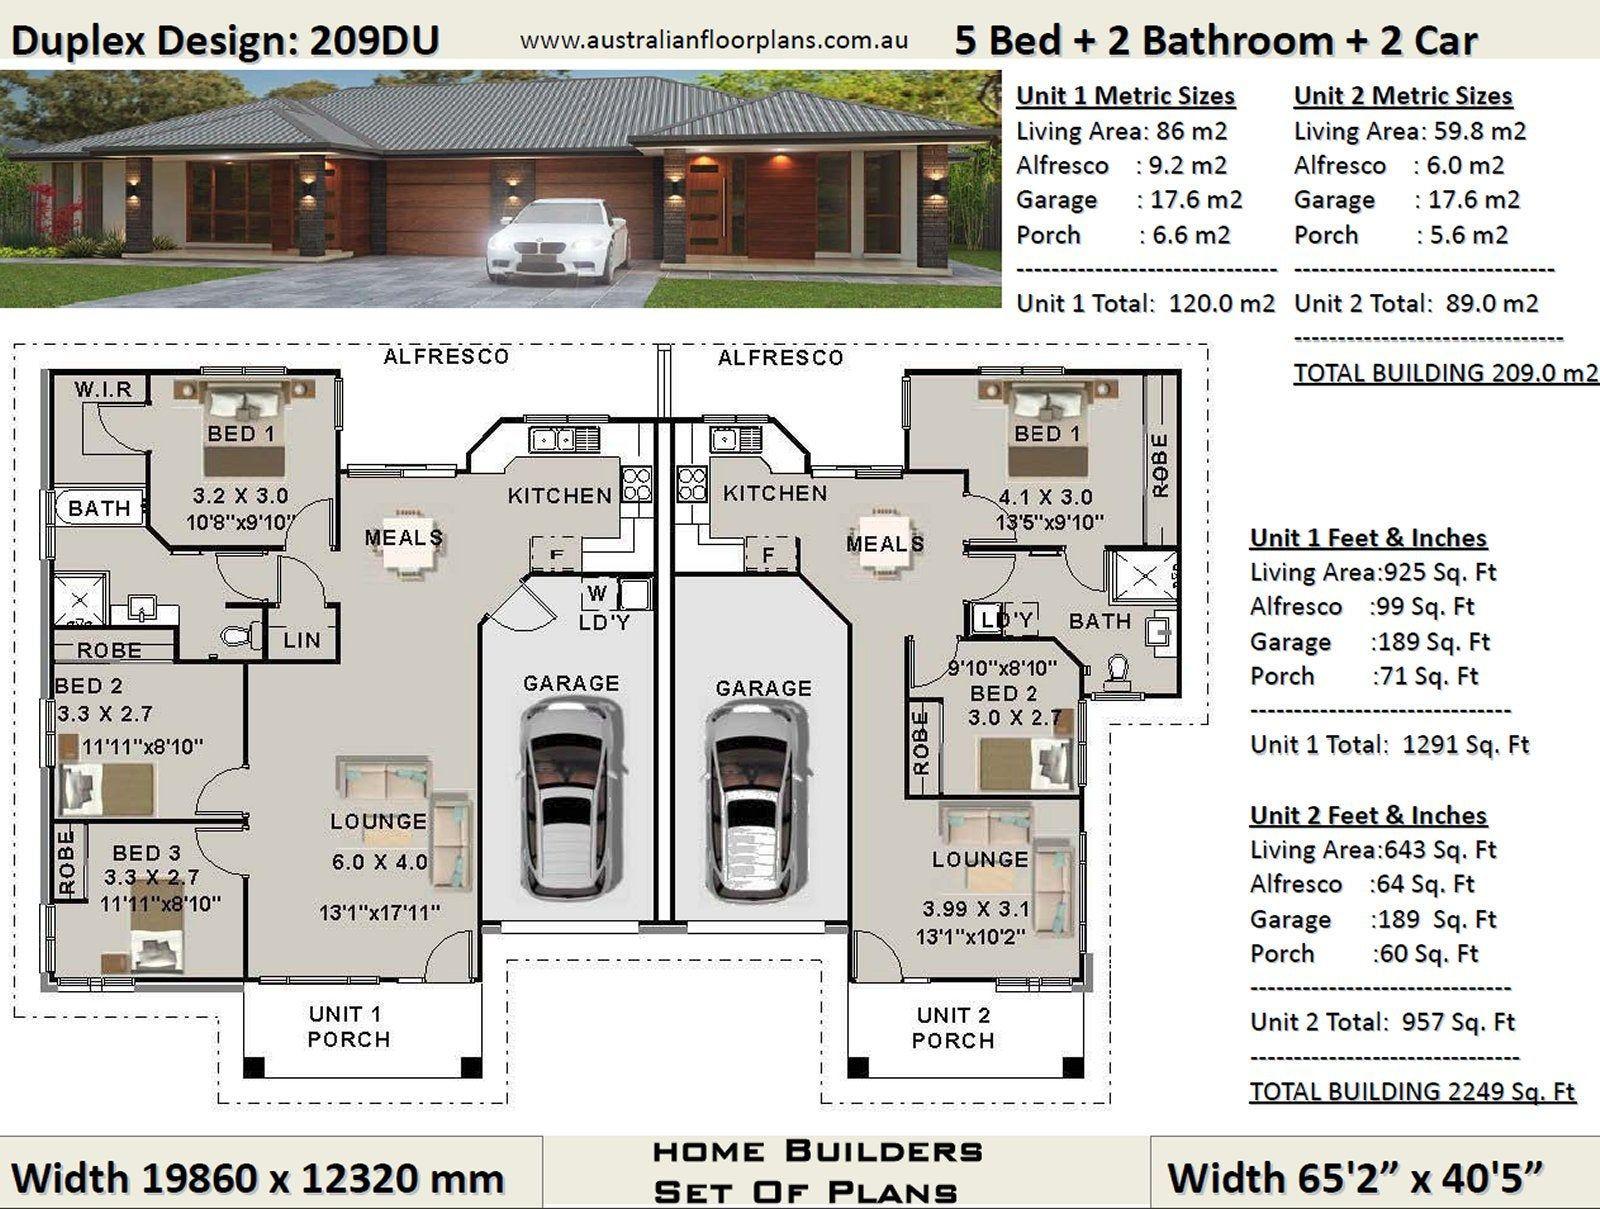 5 Bed 2 bath duplex house plans 3 x 2 bedroom duplex